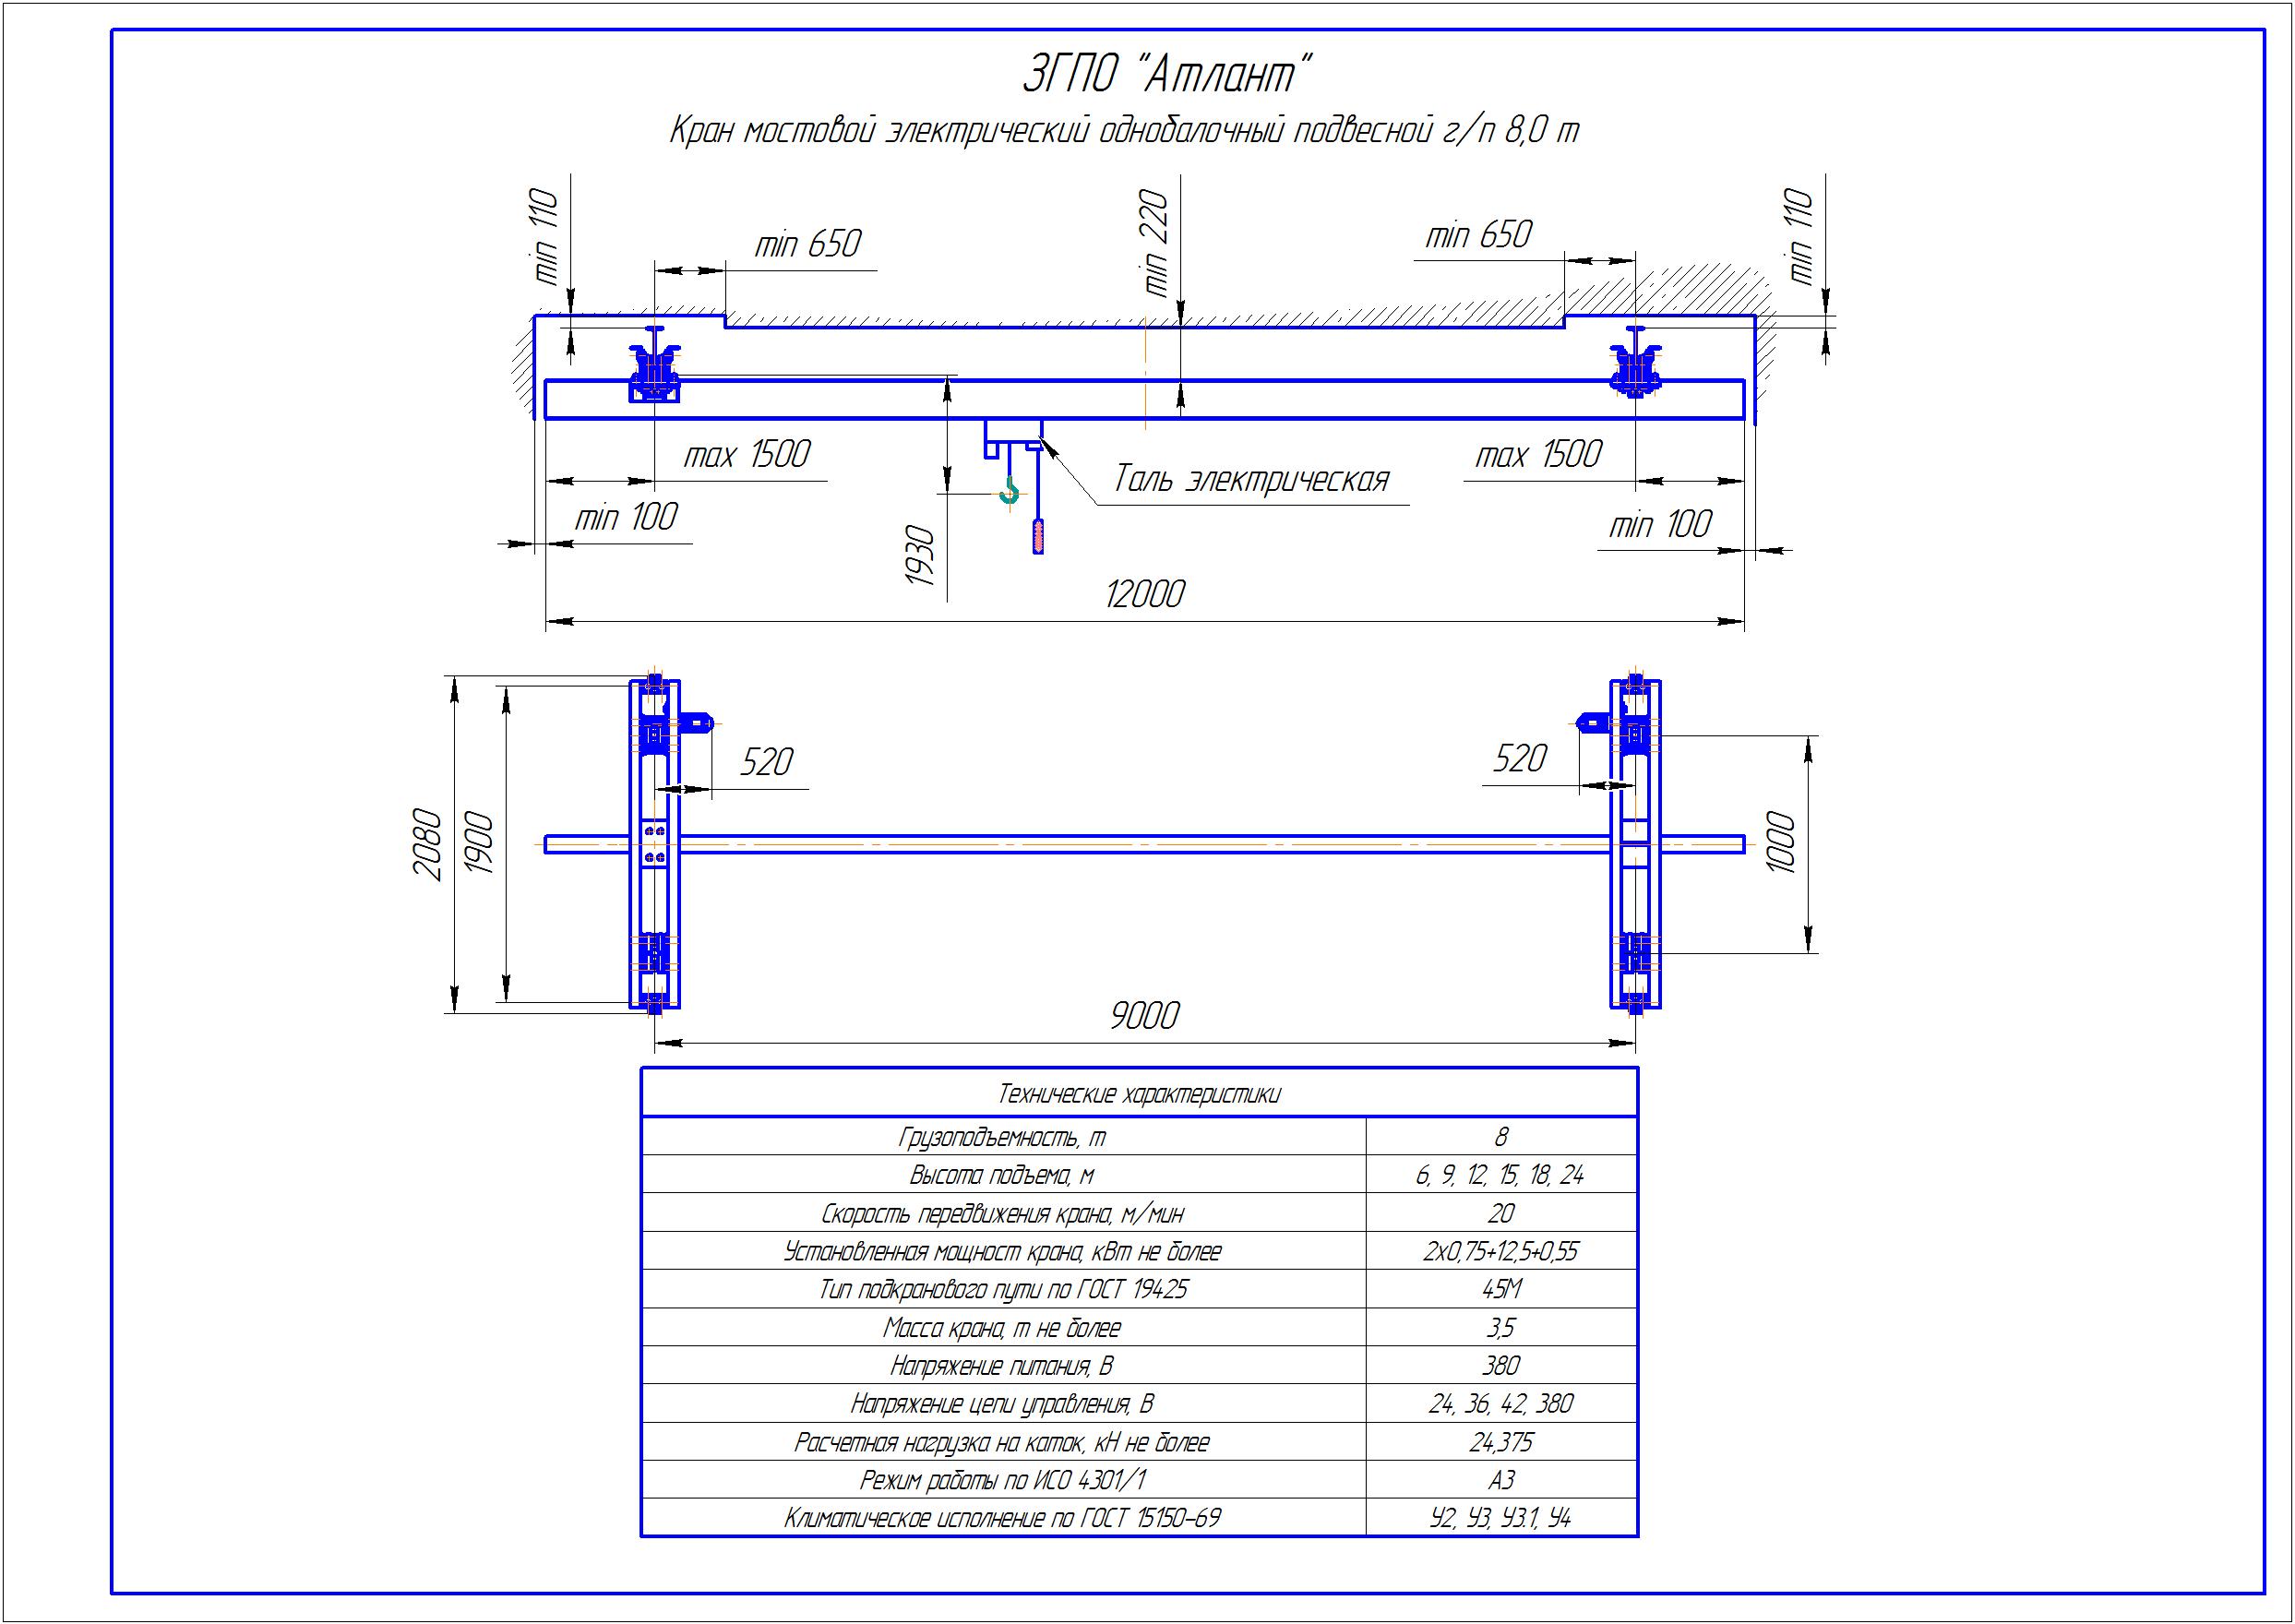 KBP 6 3 - Подвесная кран балка